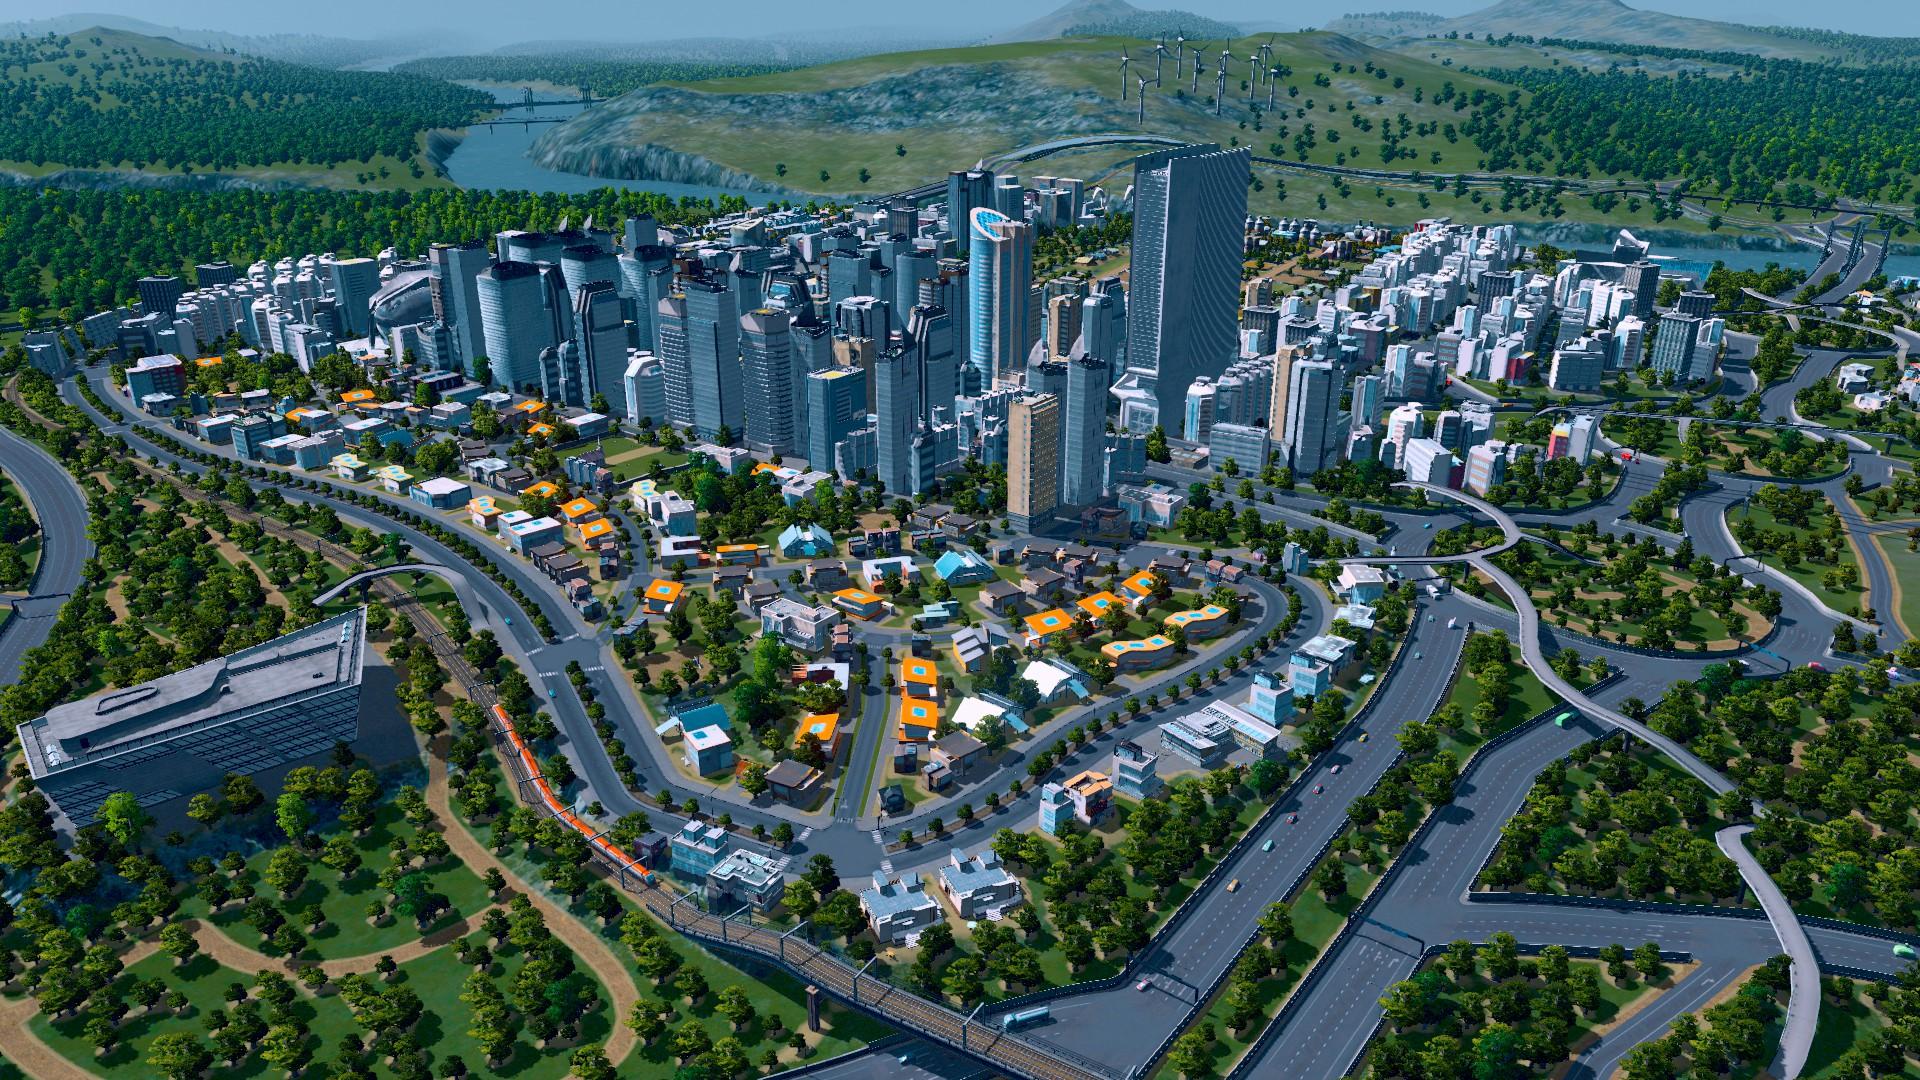 Cities skylines traffic lights mod download | Roads